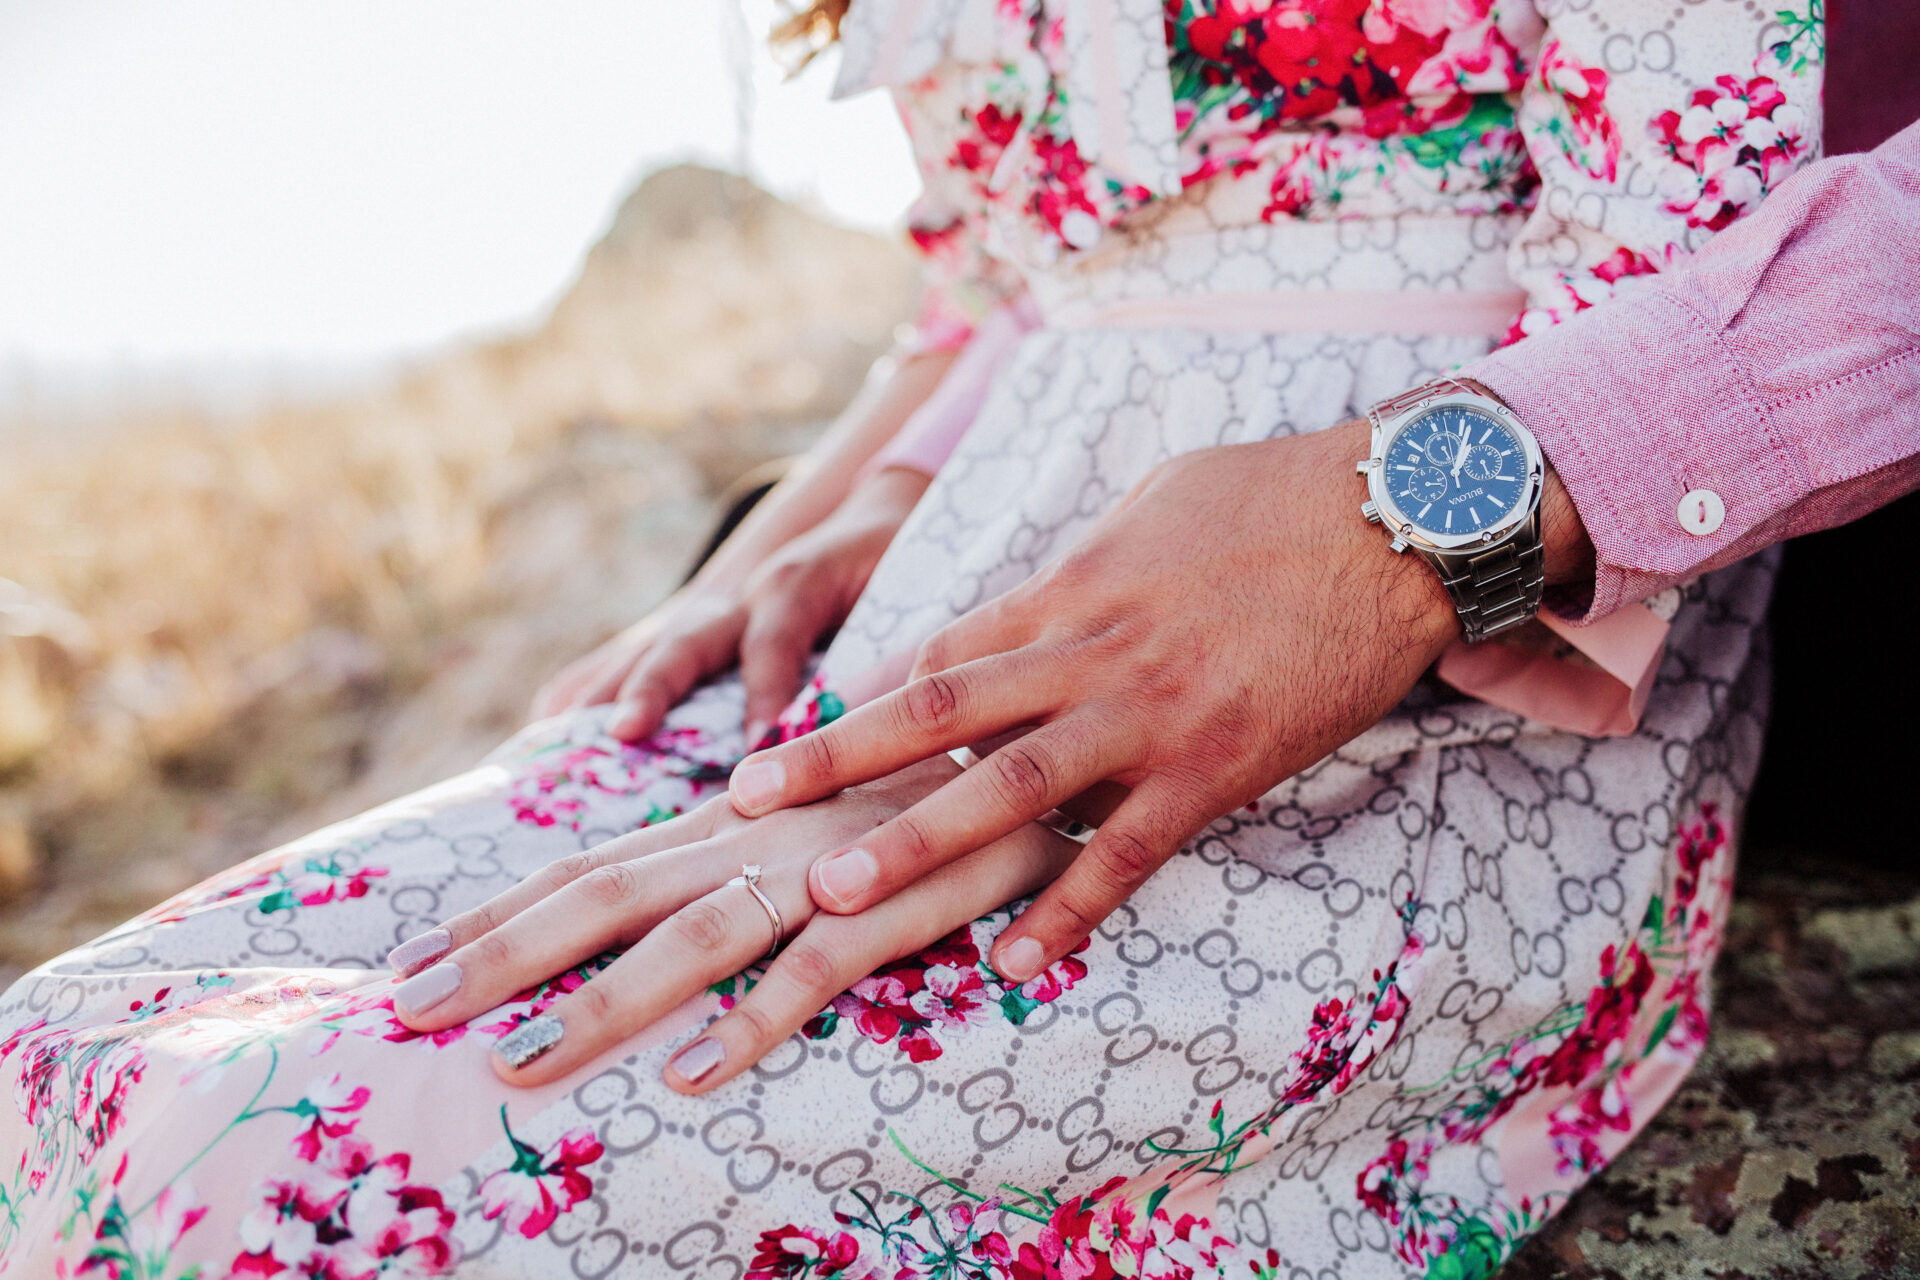 javier_noriega_fotografo_bodas_save_the_date_preboda_zacatecas_wedding_photographer9